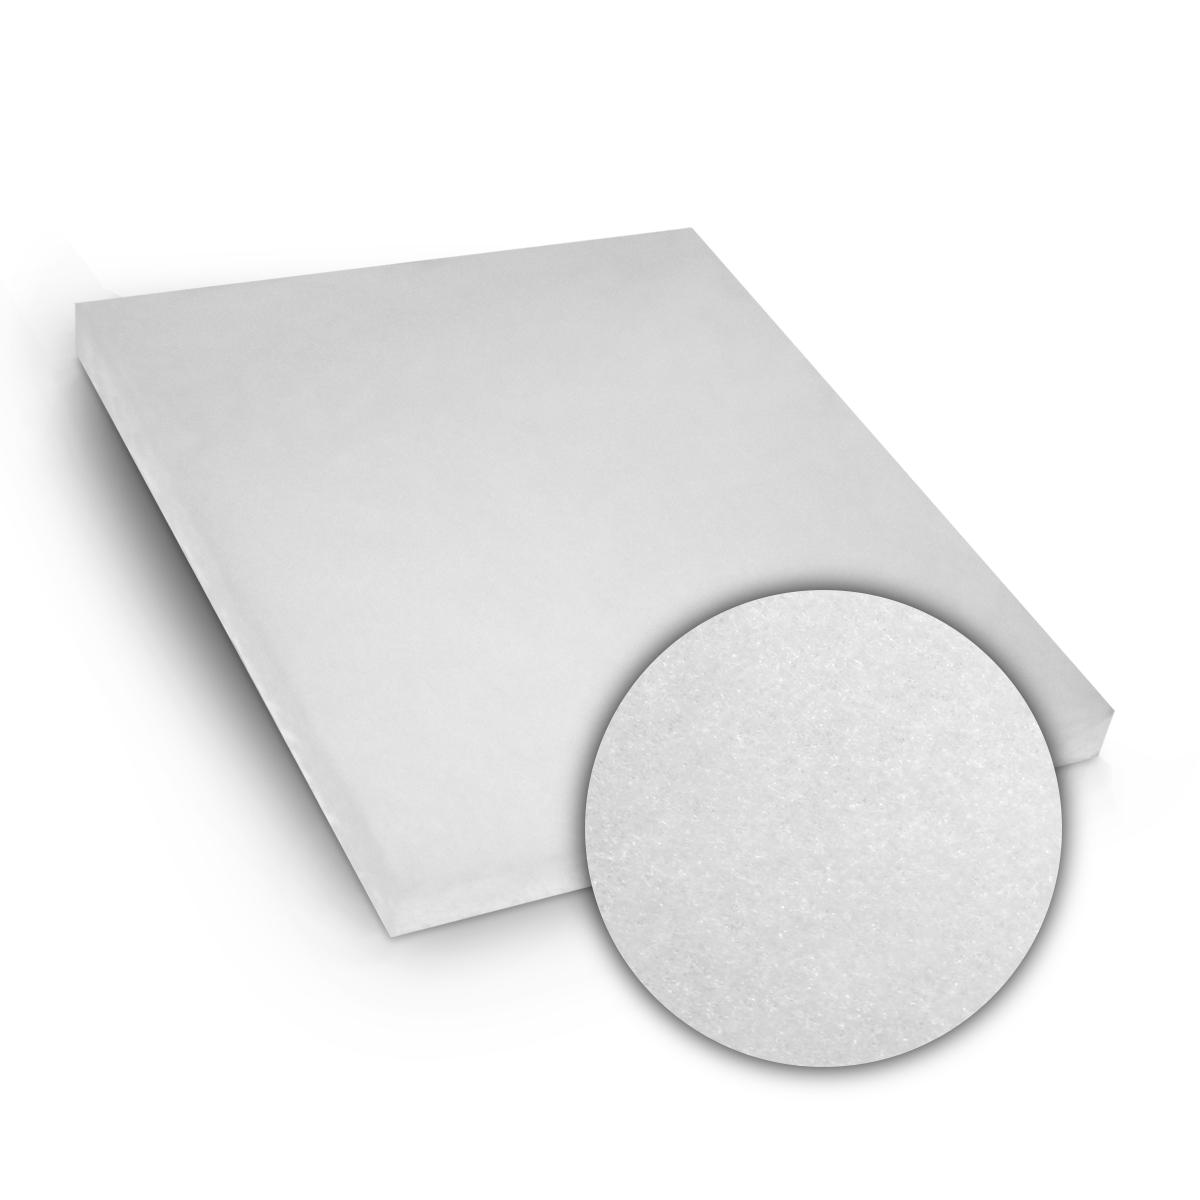 20x25x1 Sure-Fit LEVEL 10 MERV 10 Anti-Microbial Pad